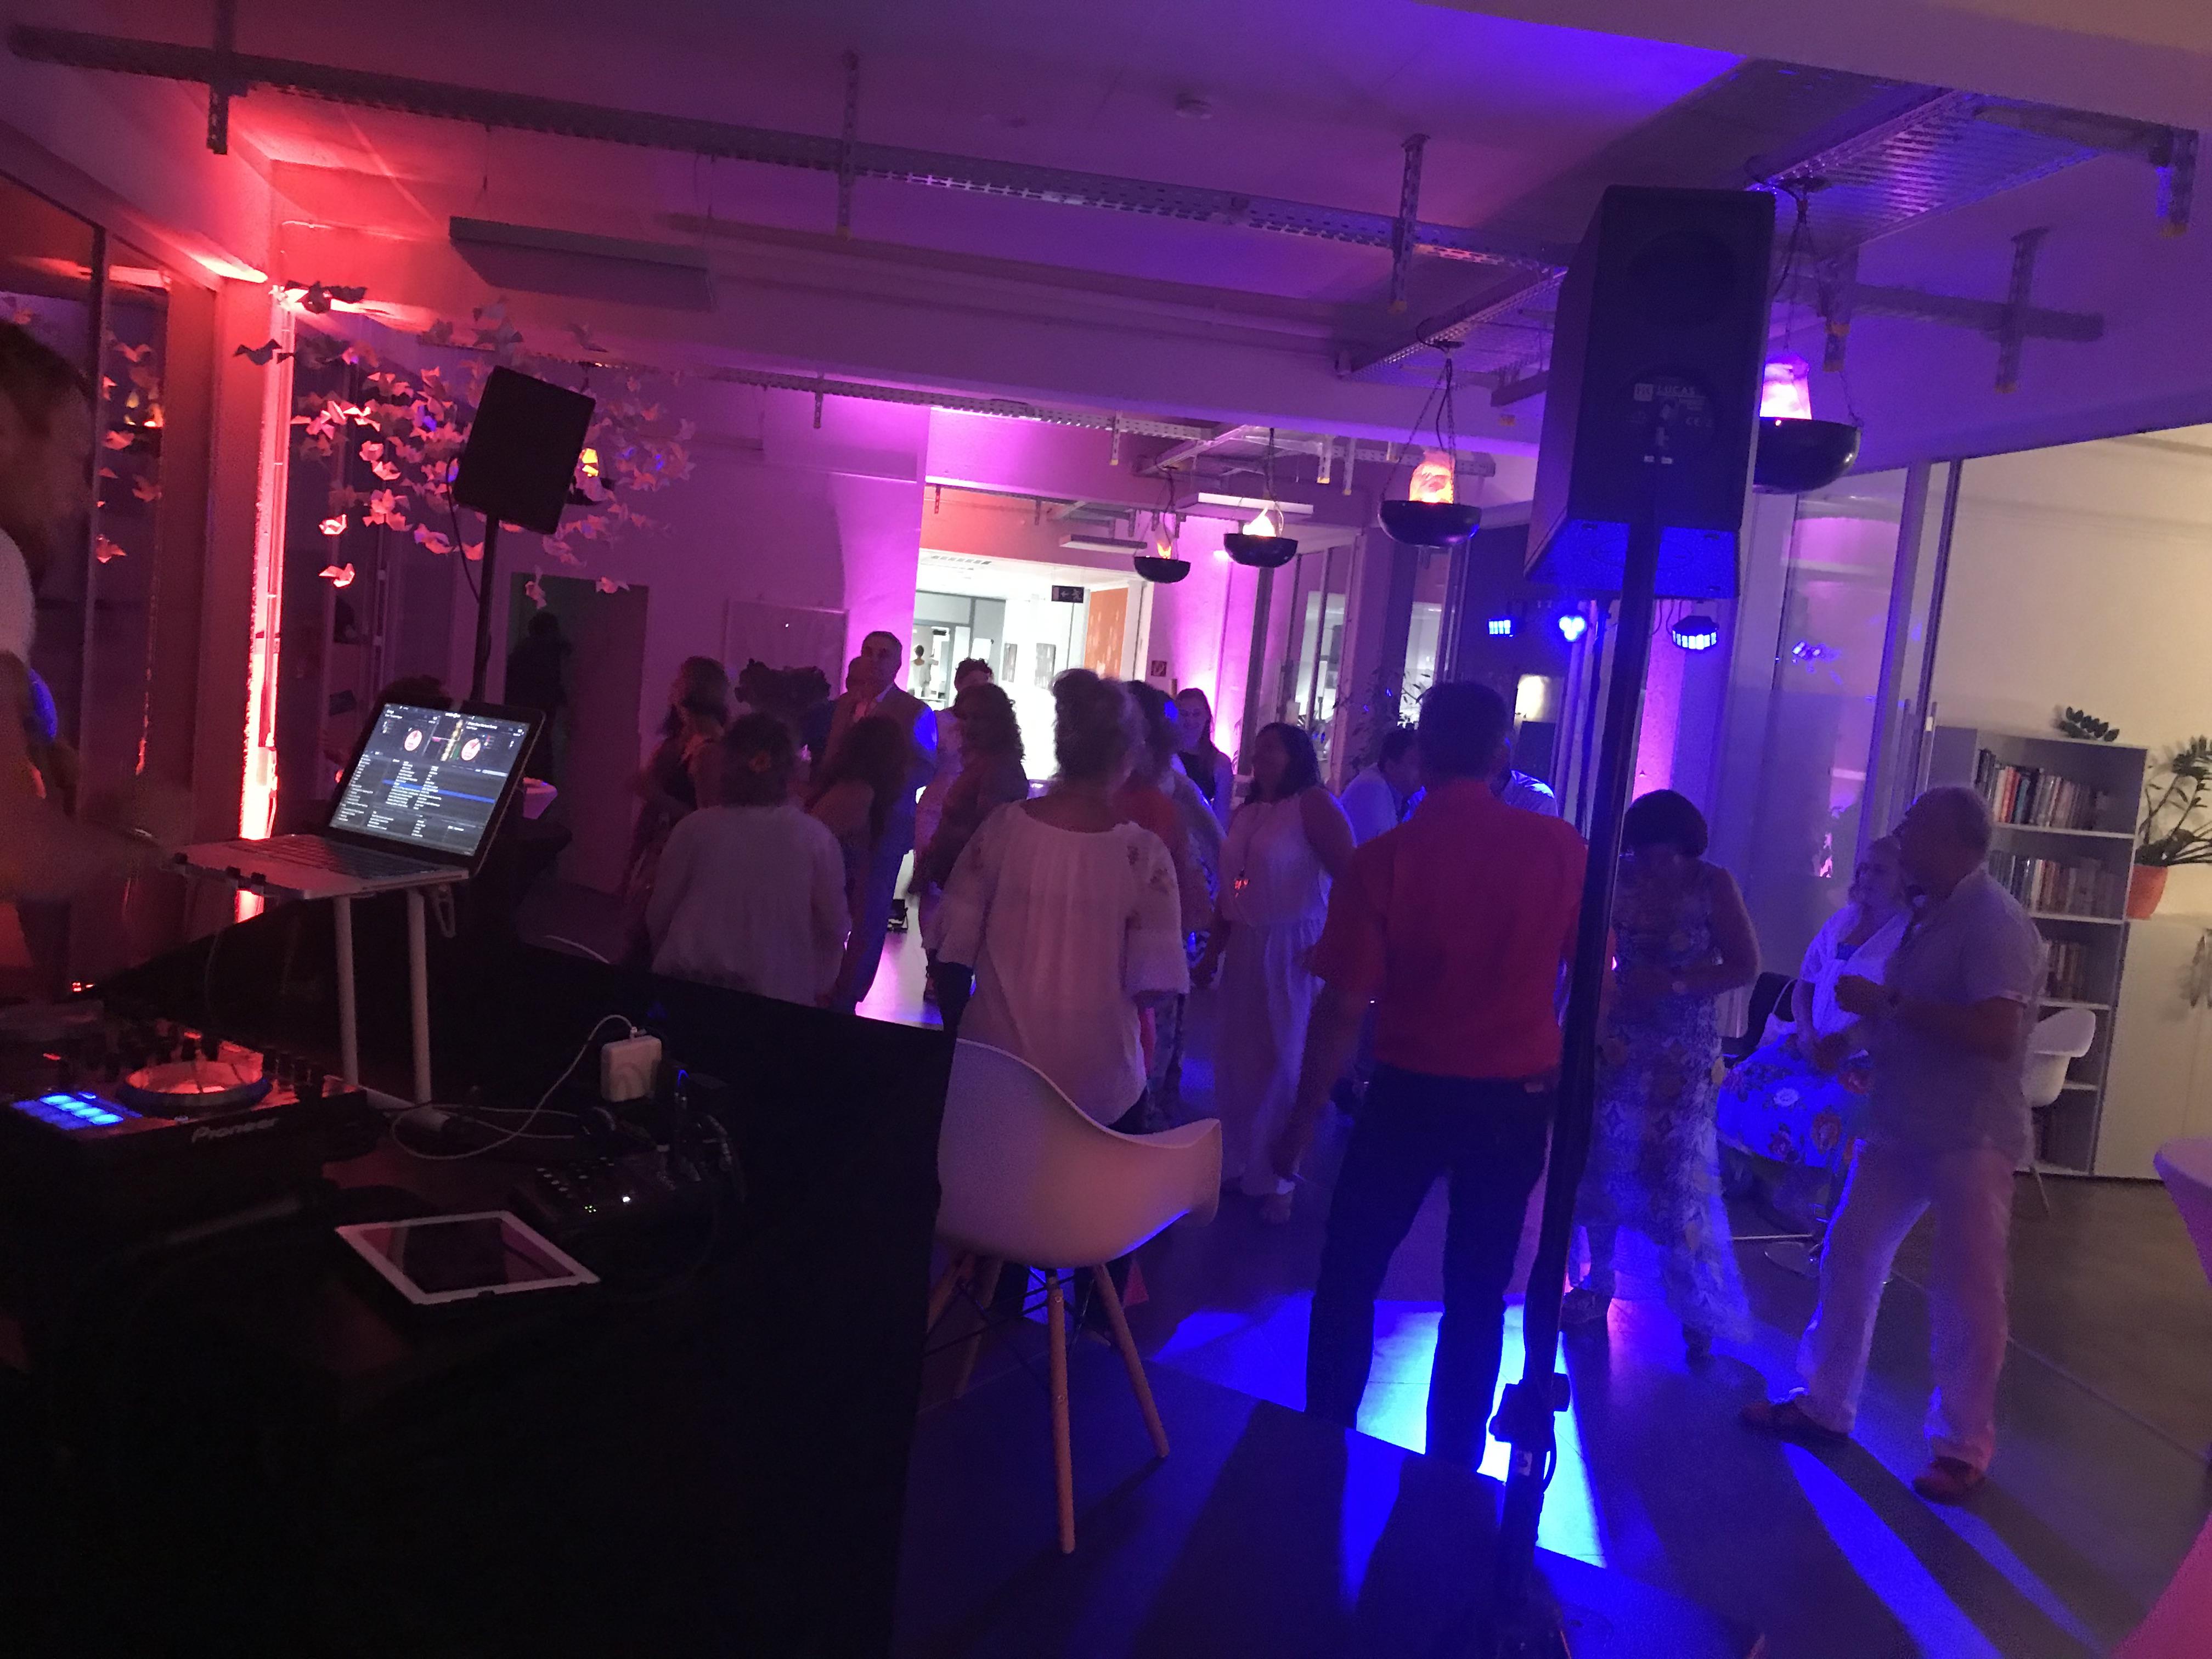 Sabath Media Blog - Das war unser Midsummer Event 2018 - Bild 1